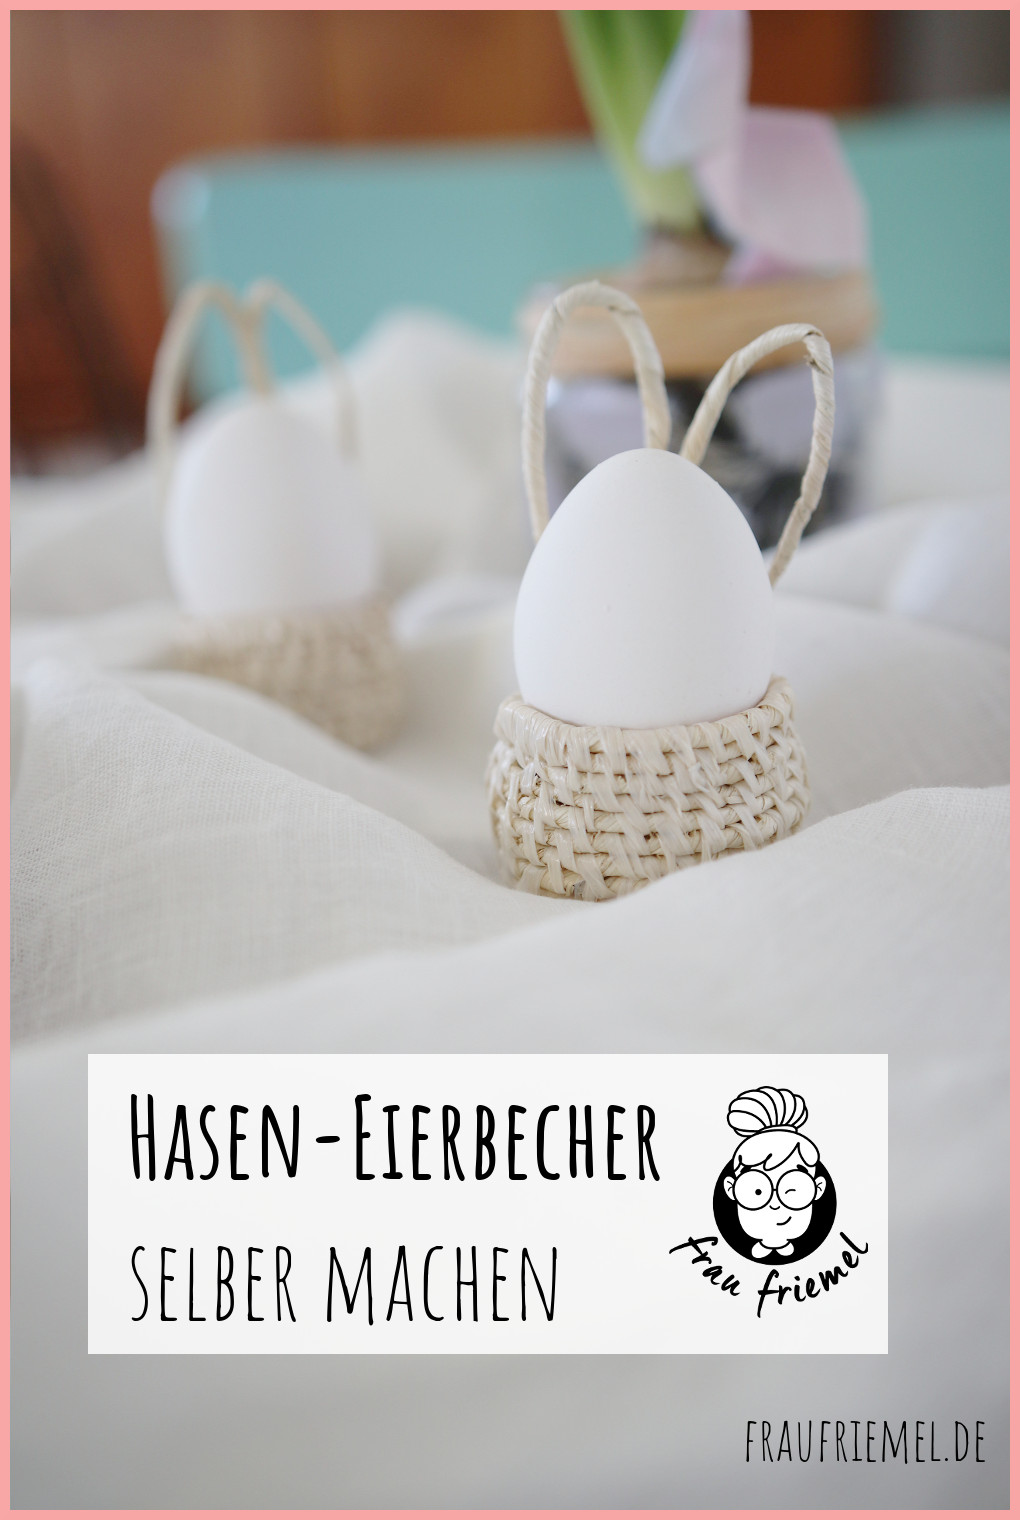 Eierbecher basteln auf Pinterest merken